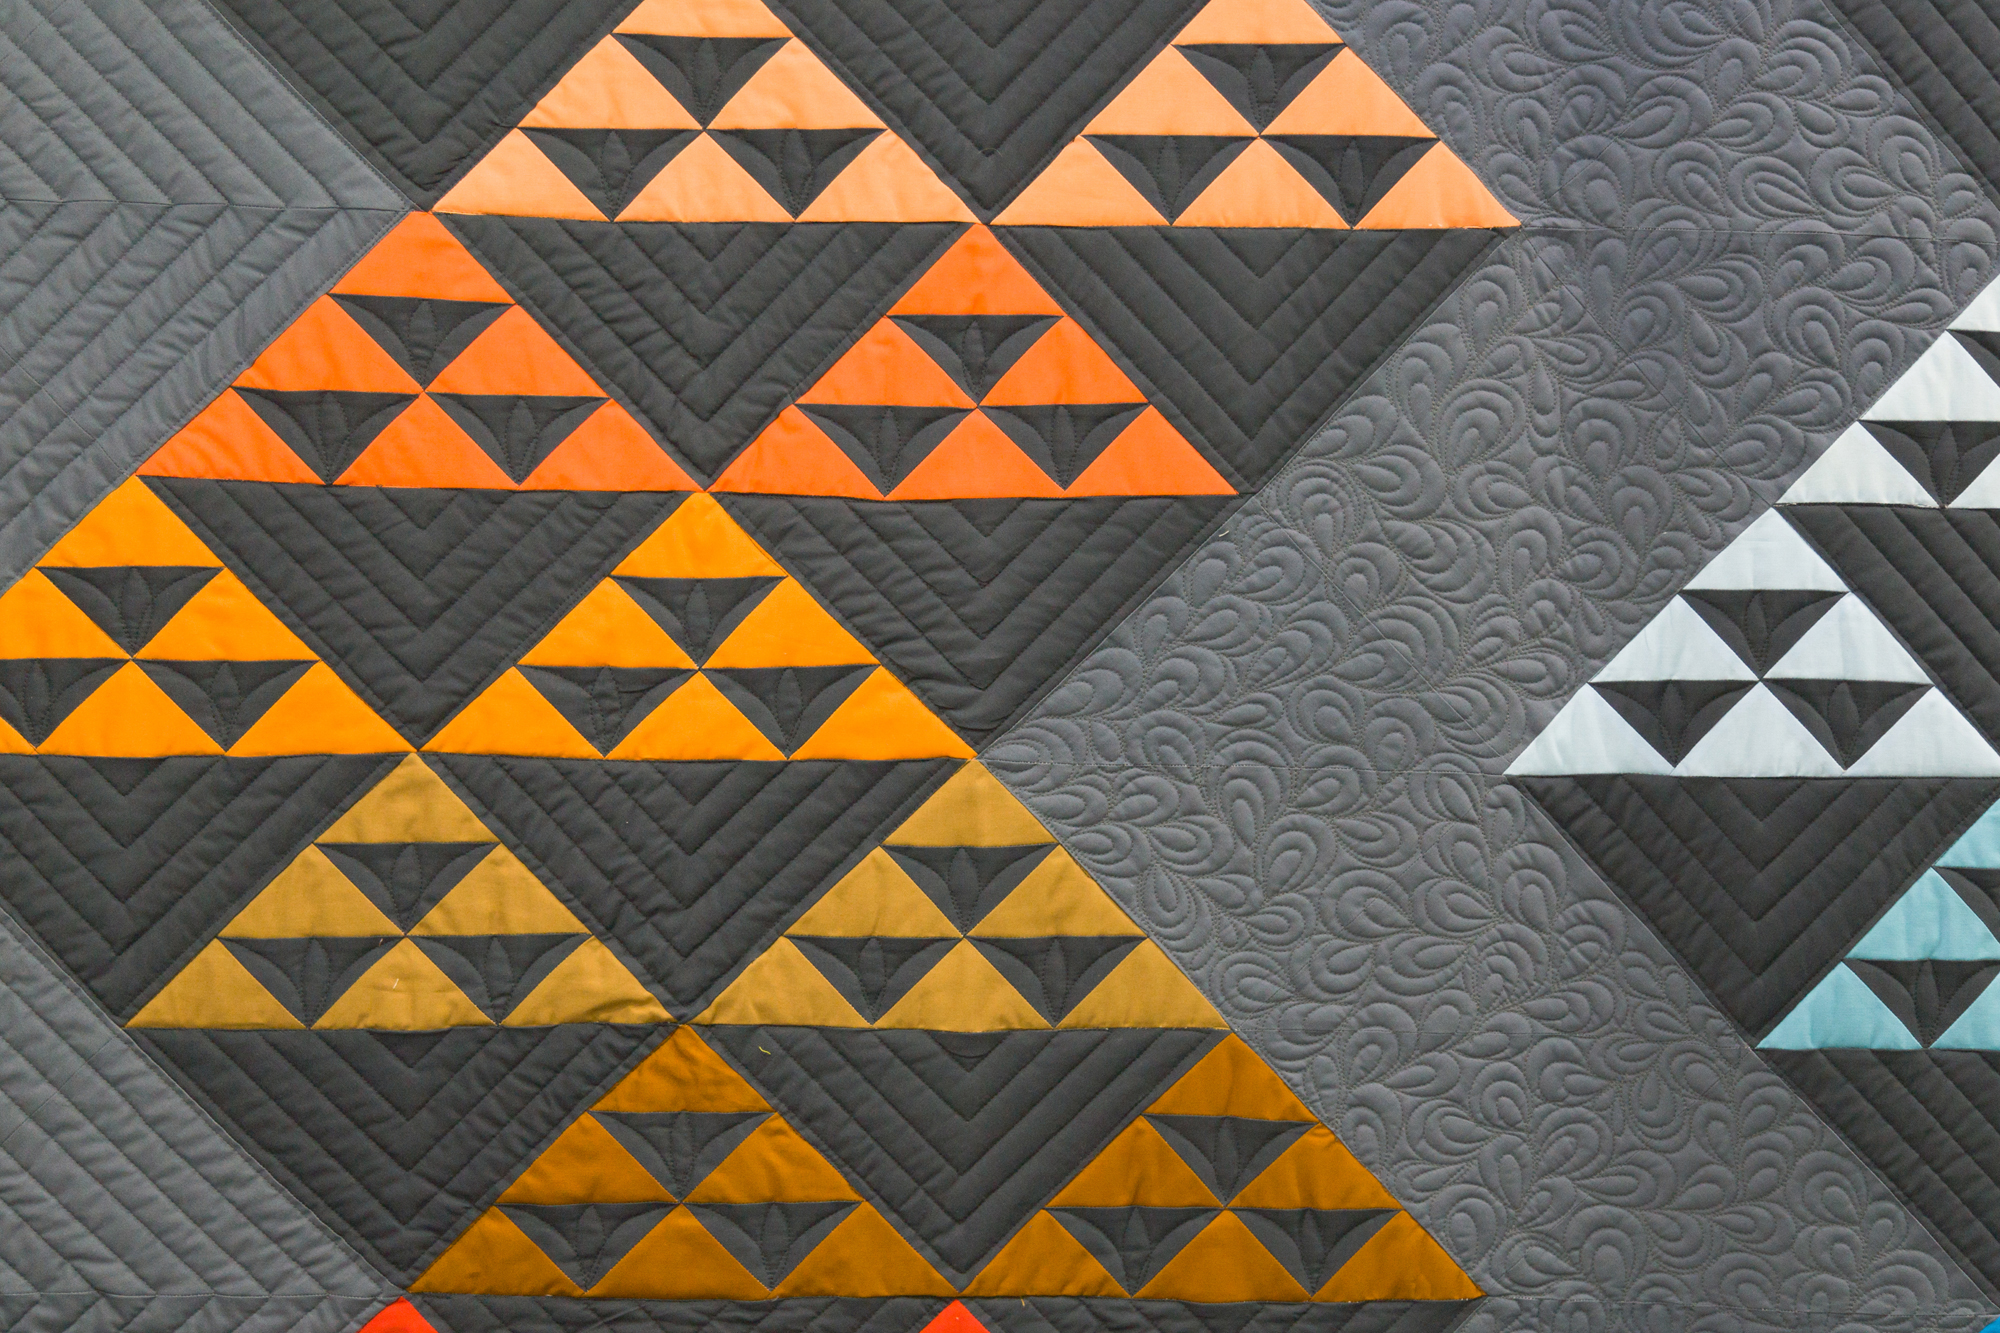 RK_QMfall17_Kona colors wall_12.jpg